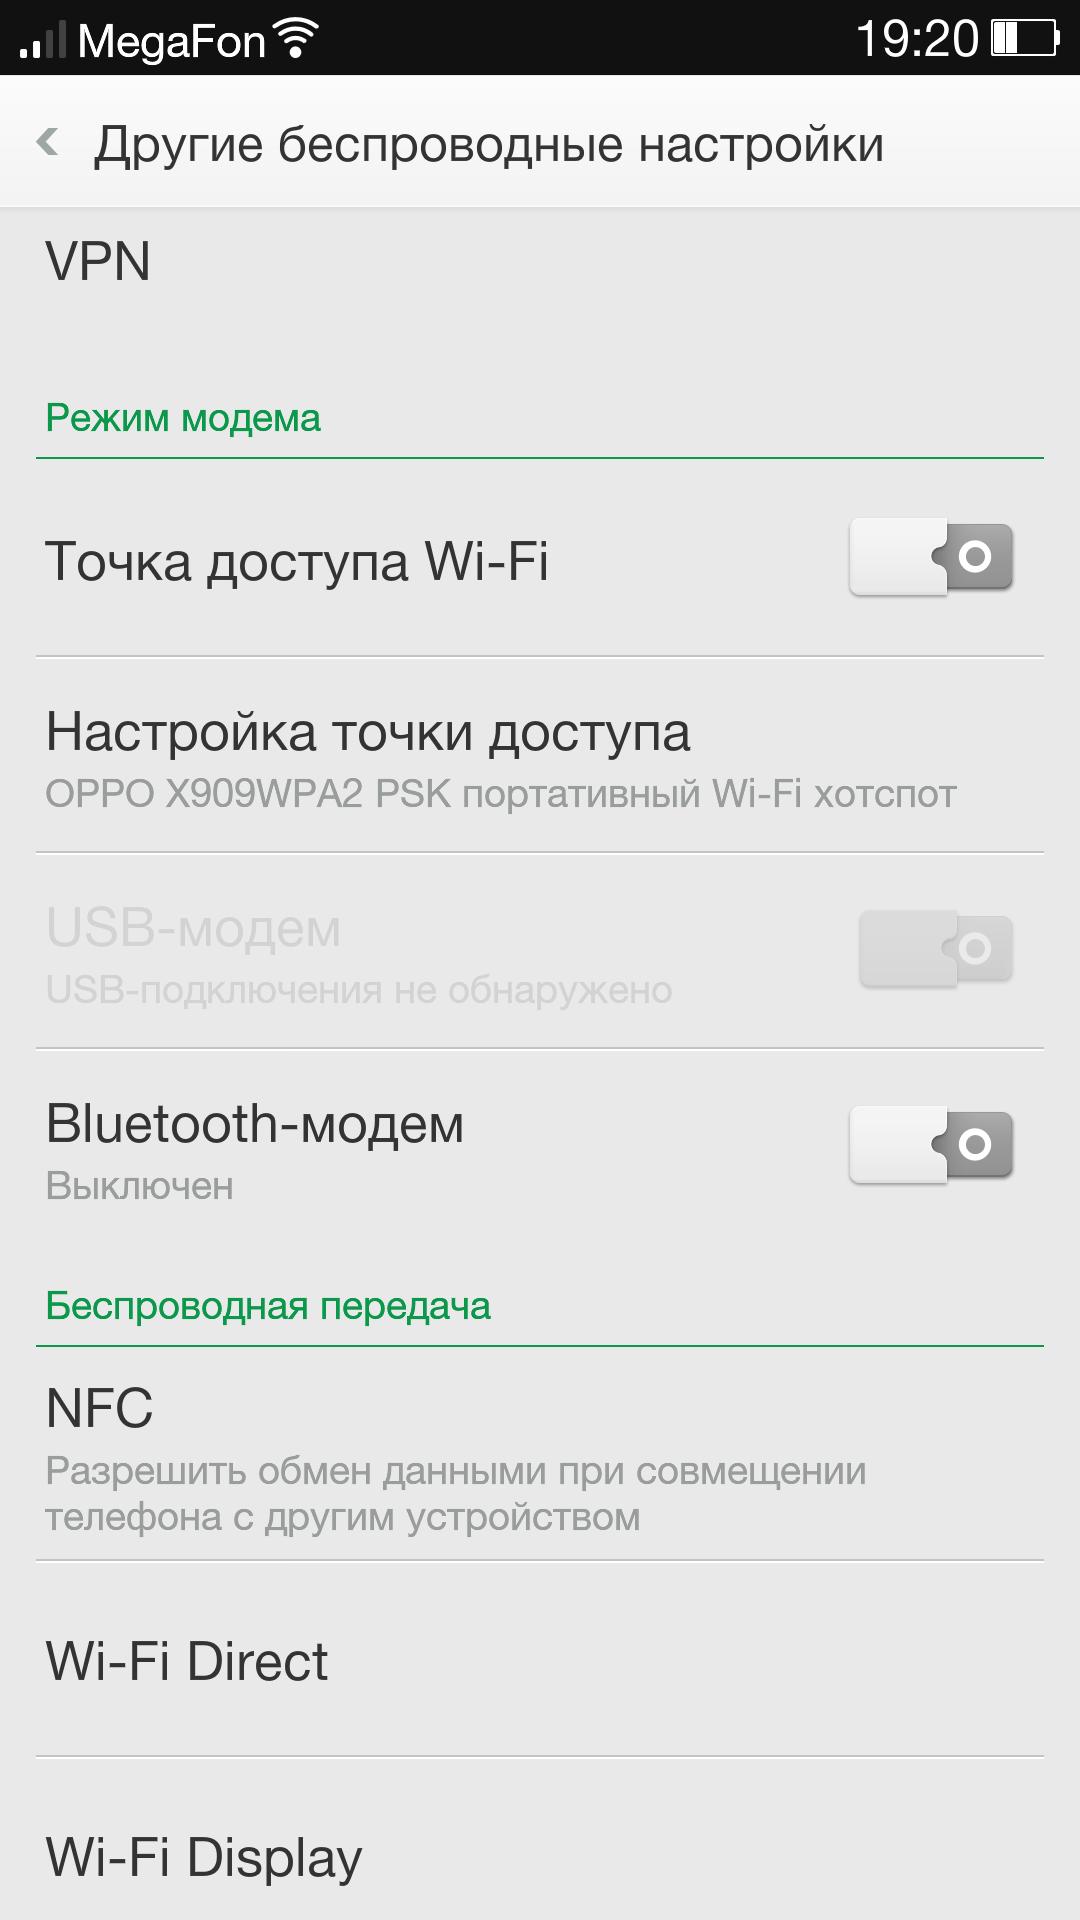 Screenshot_2013-10-26-19-20-01